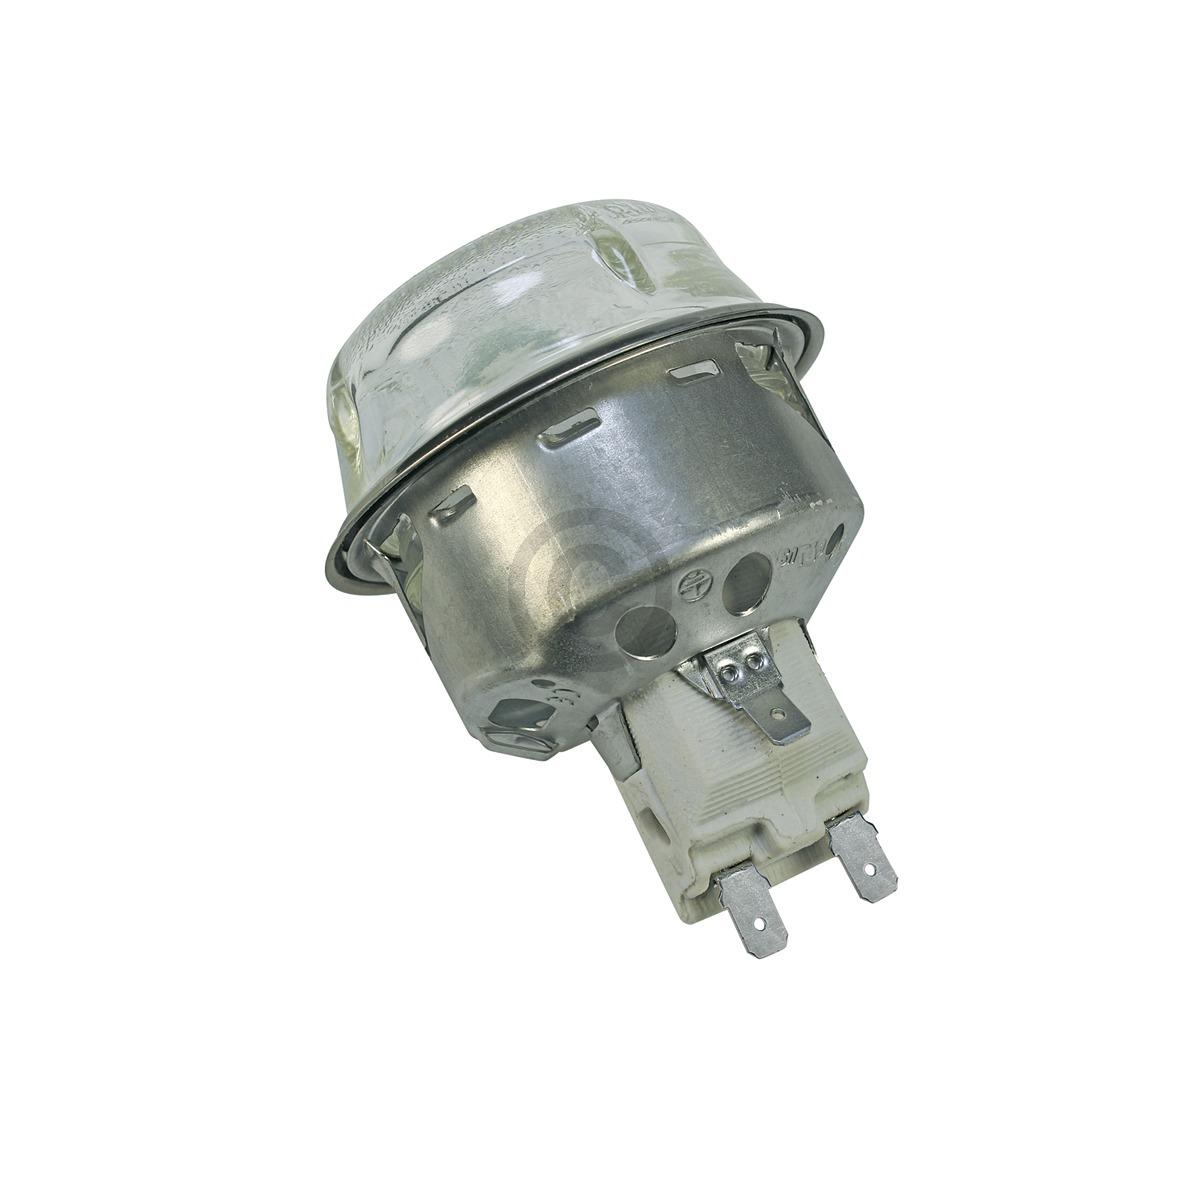 Lampeneinheit komplett 00420775 420775 Bosch, Siemens, Neff